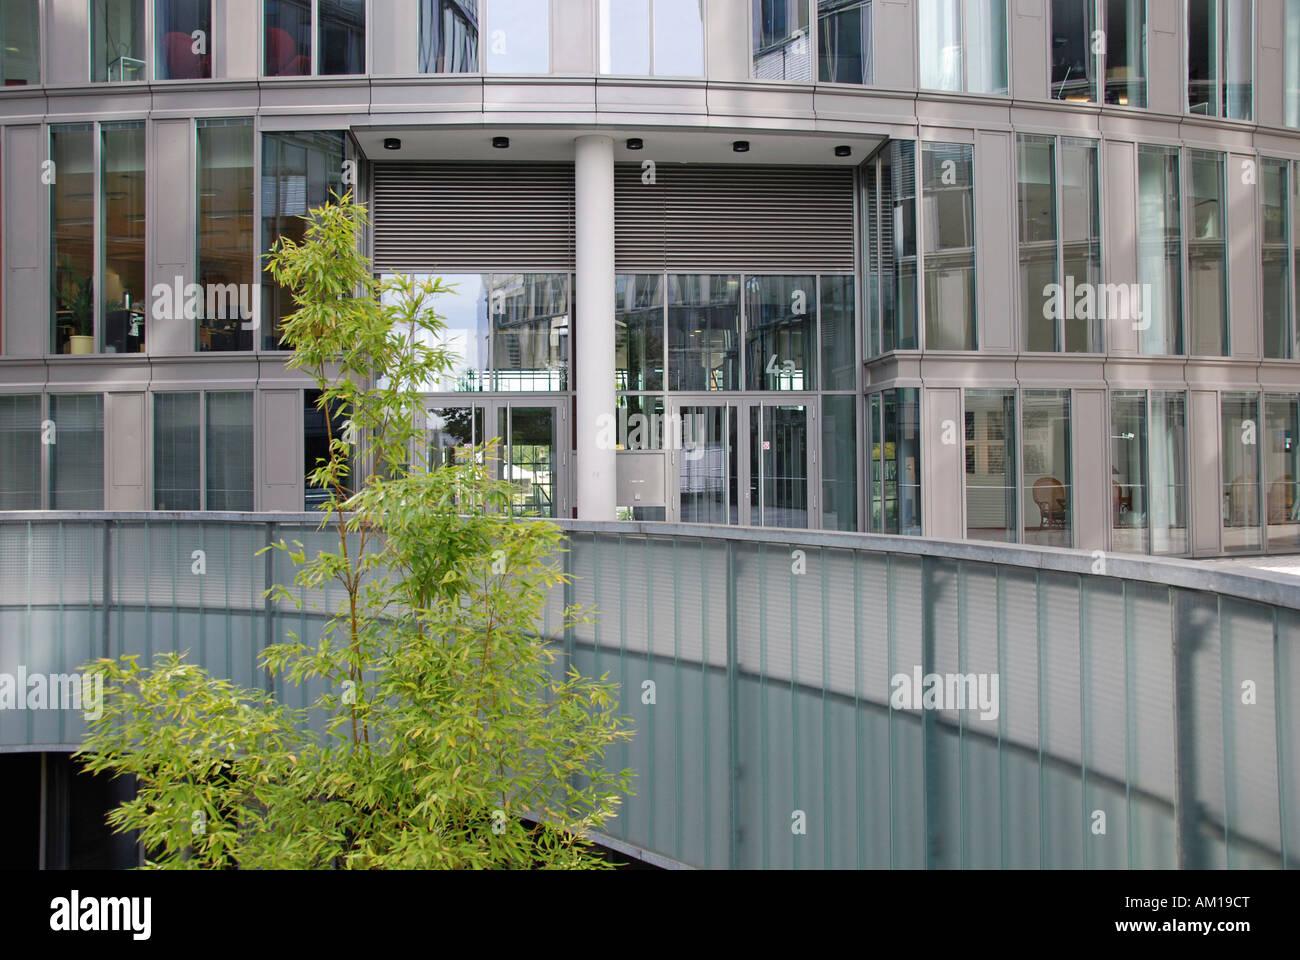 Office building, Mediapark, Cologne, Germany - Stock Image